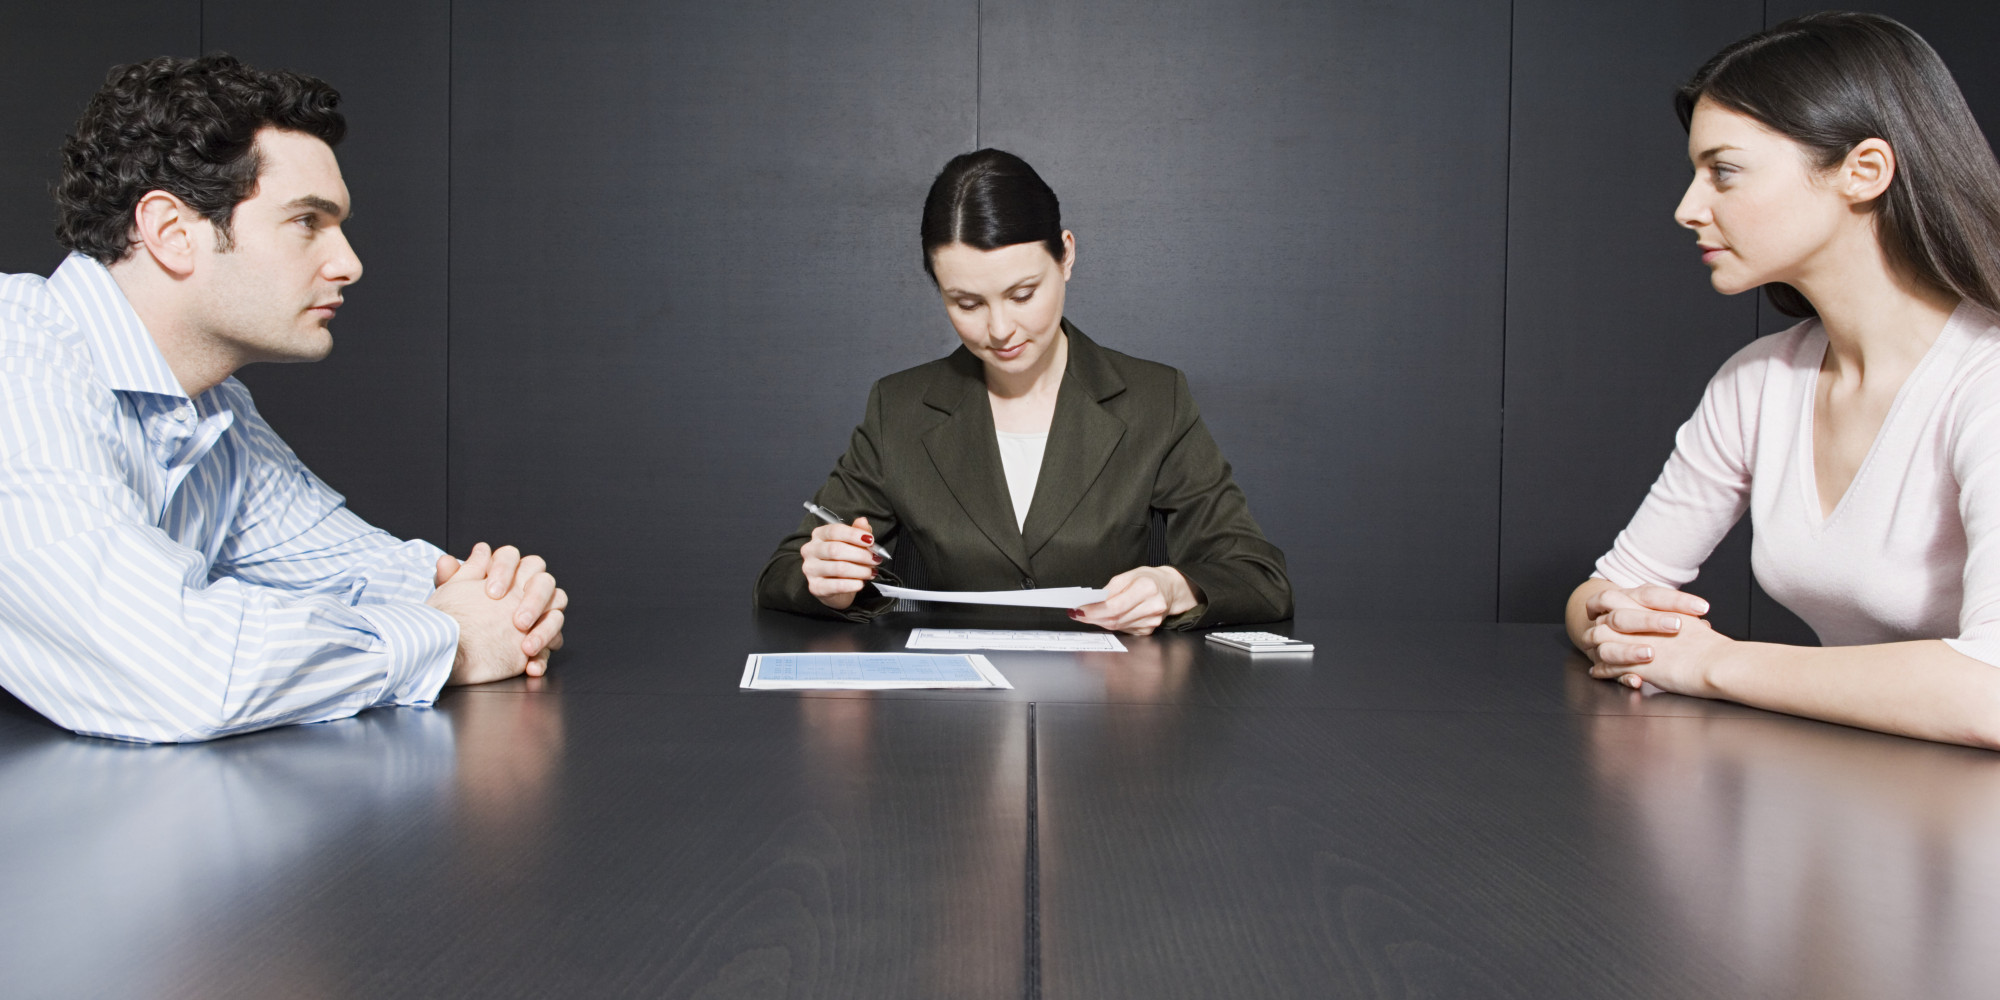 divorce attorney to facilitate the divorce